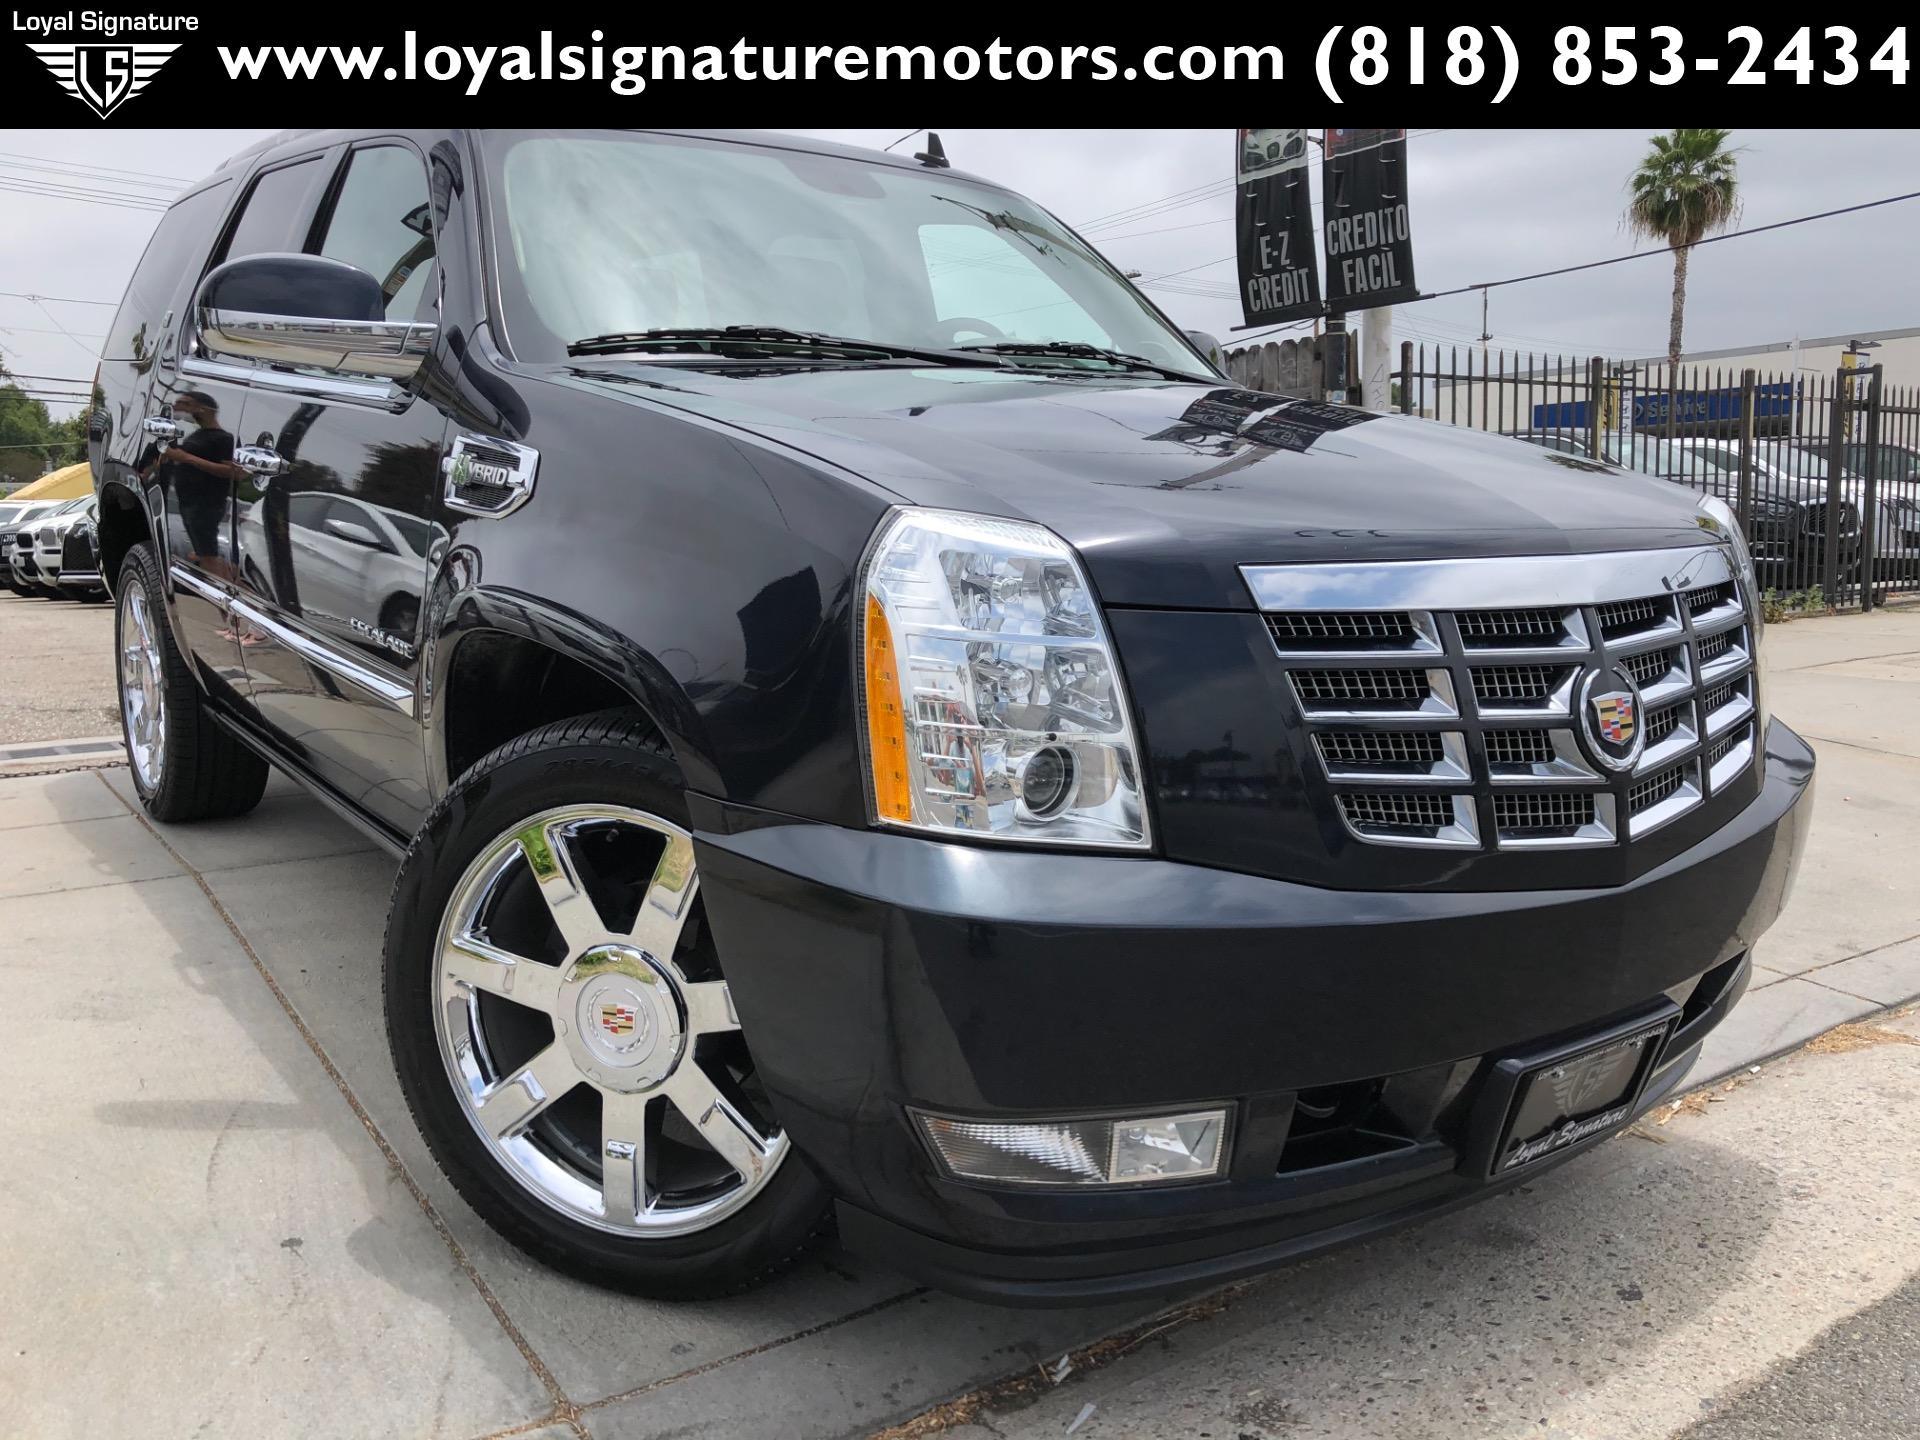 Used 2013 Cadillac Escalade Hybrid  | Van Nuys, CA